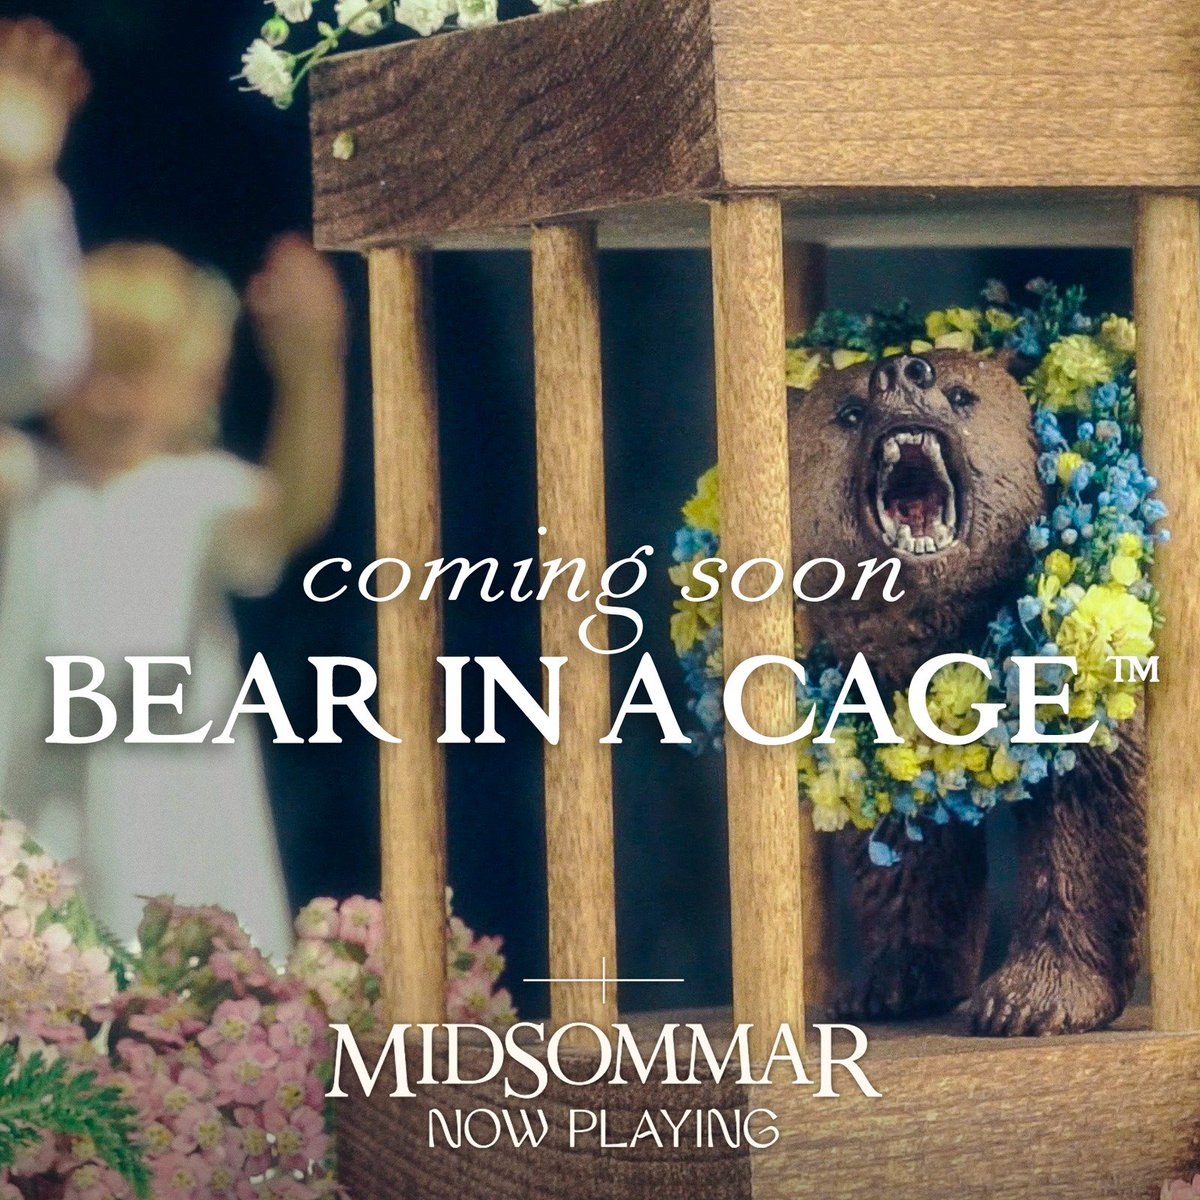 RT @A24: It's a bear. #Midsommar https://t.co/D9X7MwcbDN